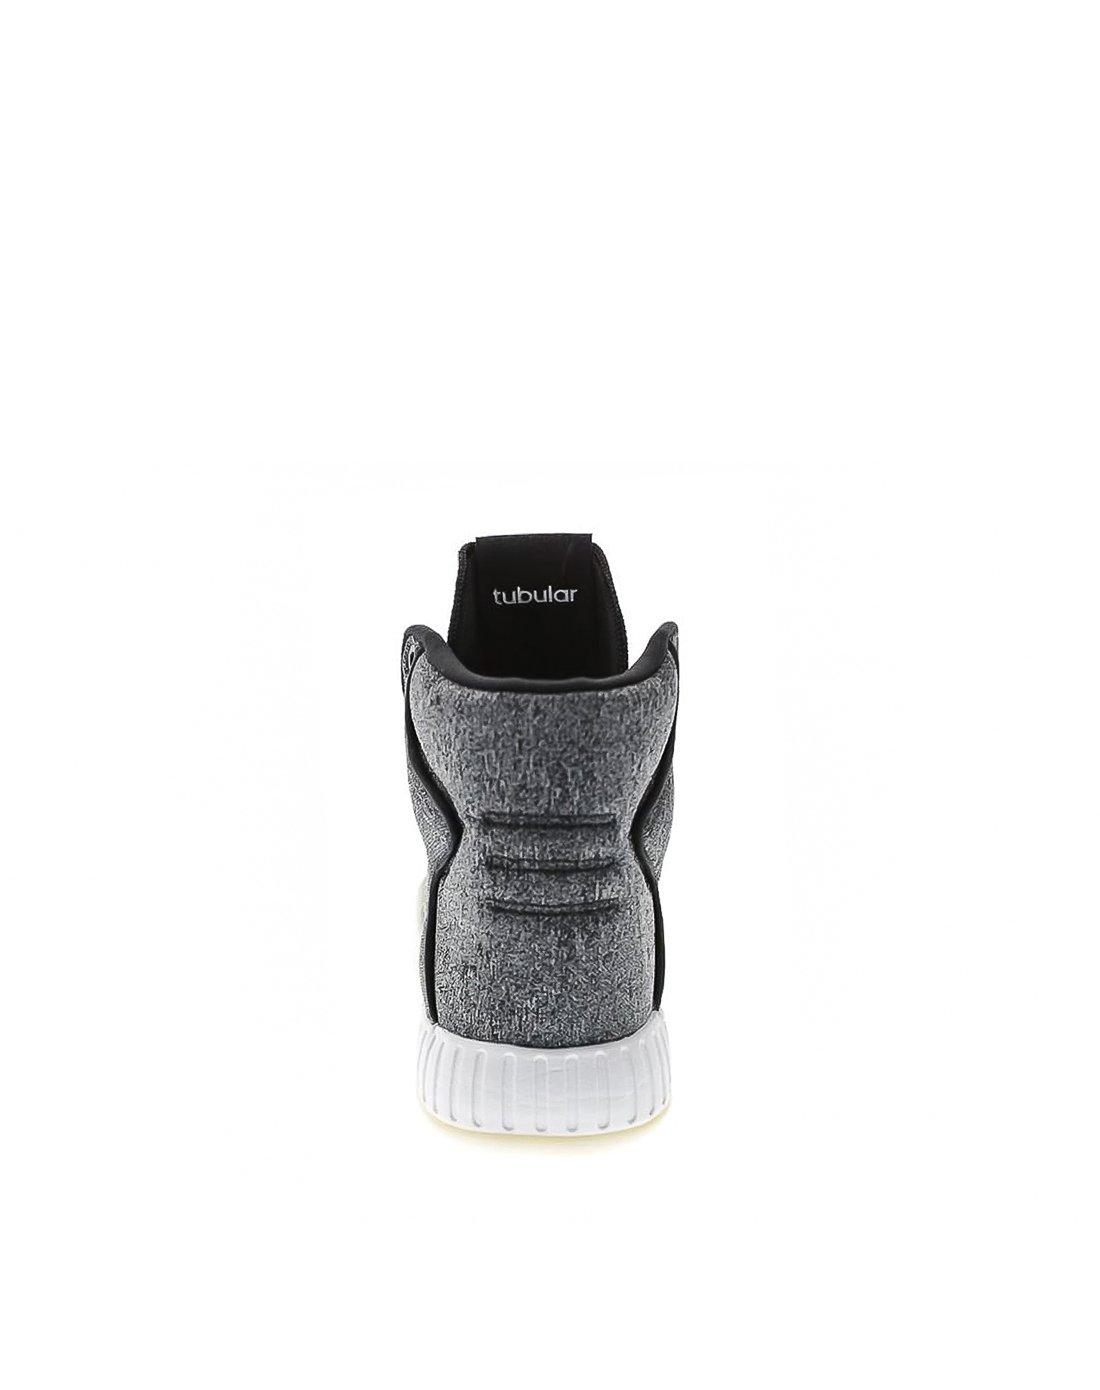 check out 75911 72605 阿迪达斯Adidas TUBULAR INSTINCT JC黑色高帮运动休闲鞋BB8420_唯品会